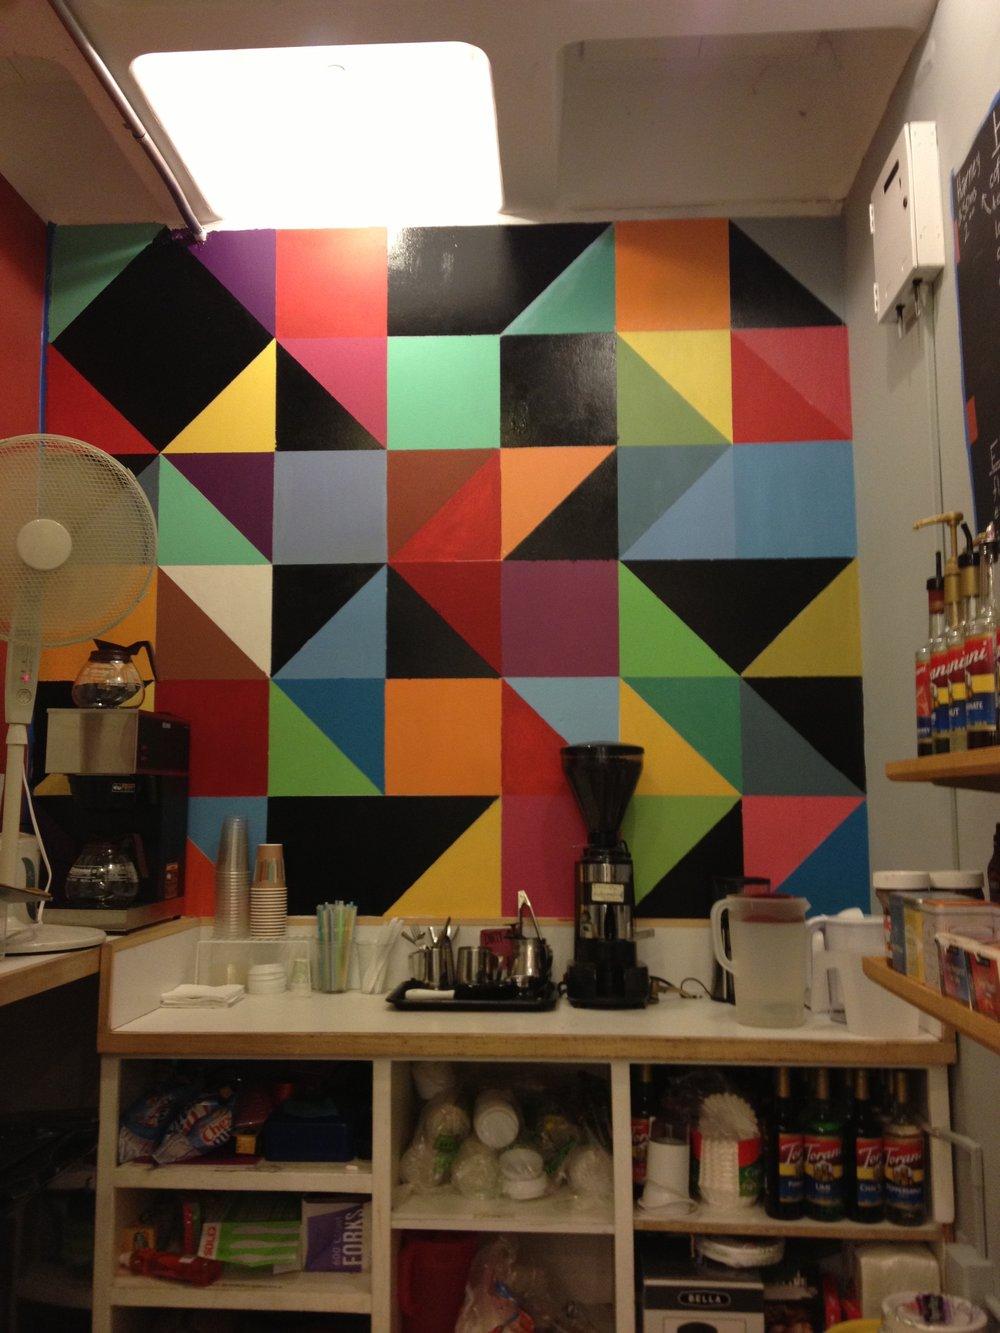 The Coffee Closet Interior II